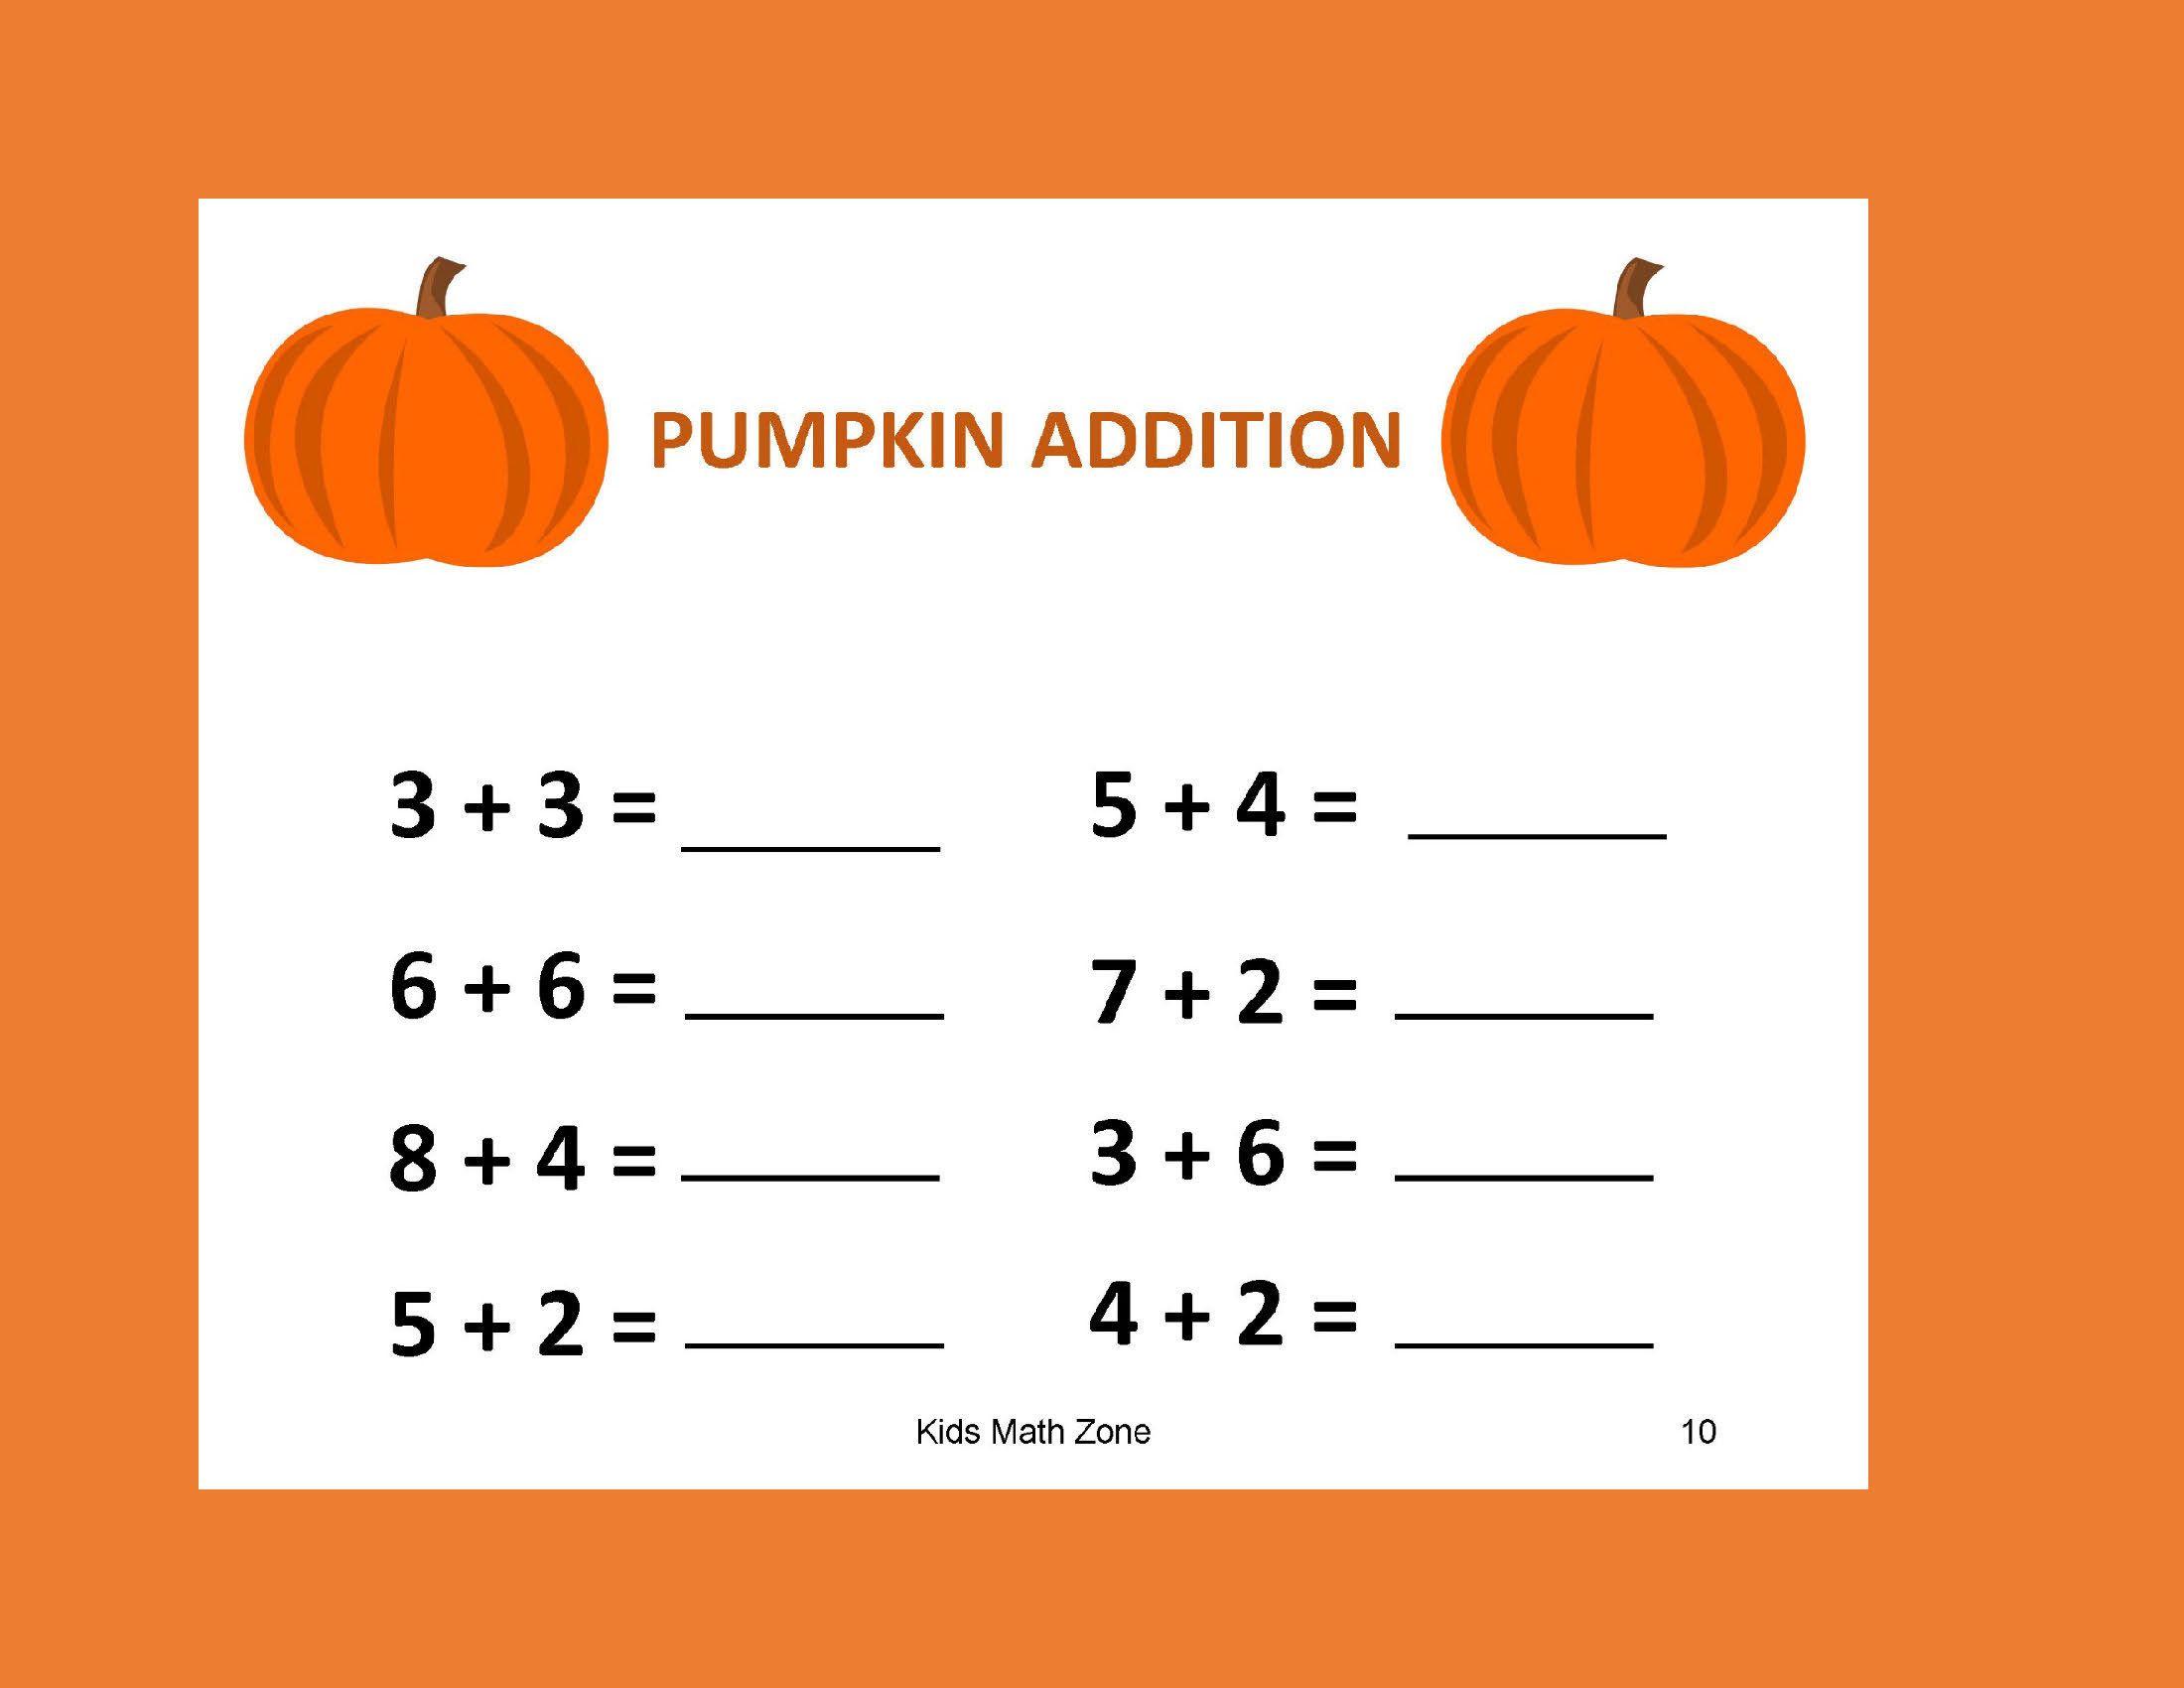 Pumpkin Addition B 12 Worksheets Pdf Preschool Kindergarten Year 1 2 Grade 1 2 Printable Work Math Worksheets Kids Math Worksheets Halloween Preschool